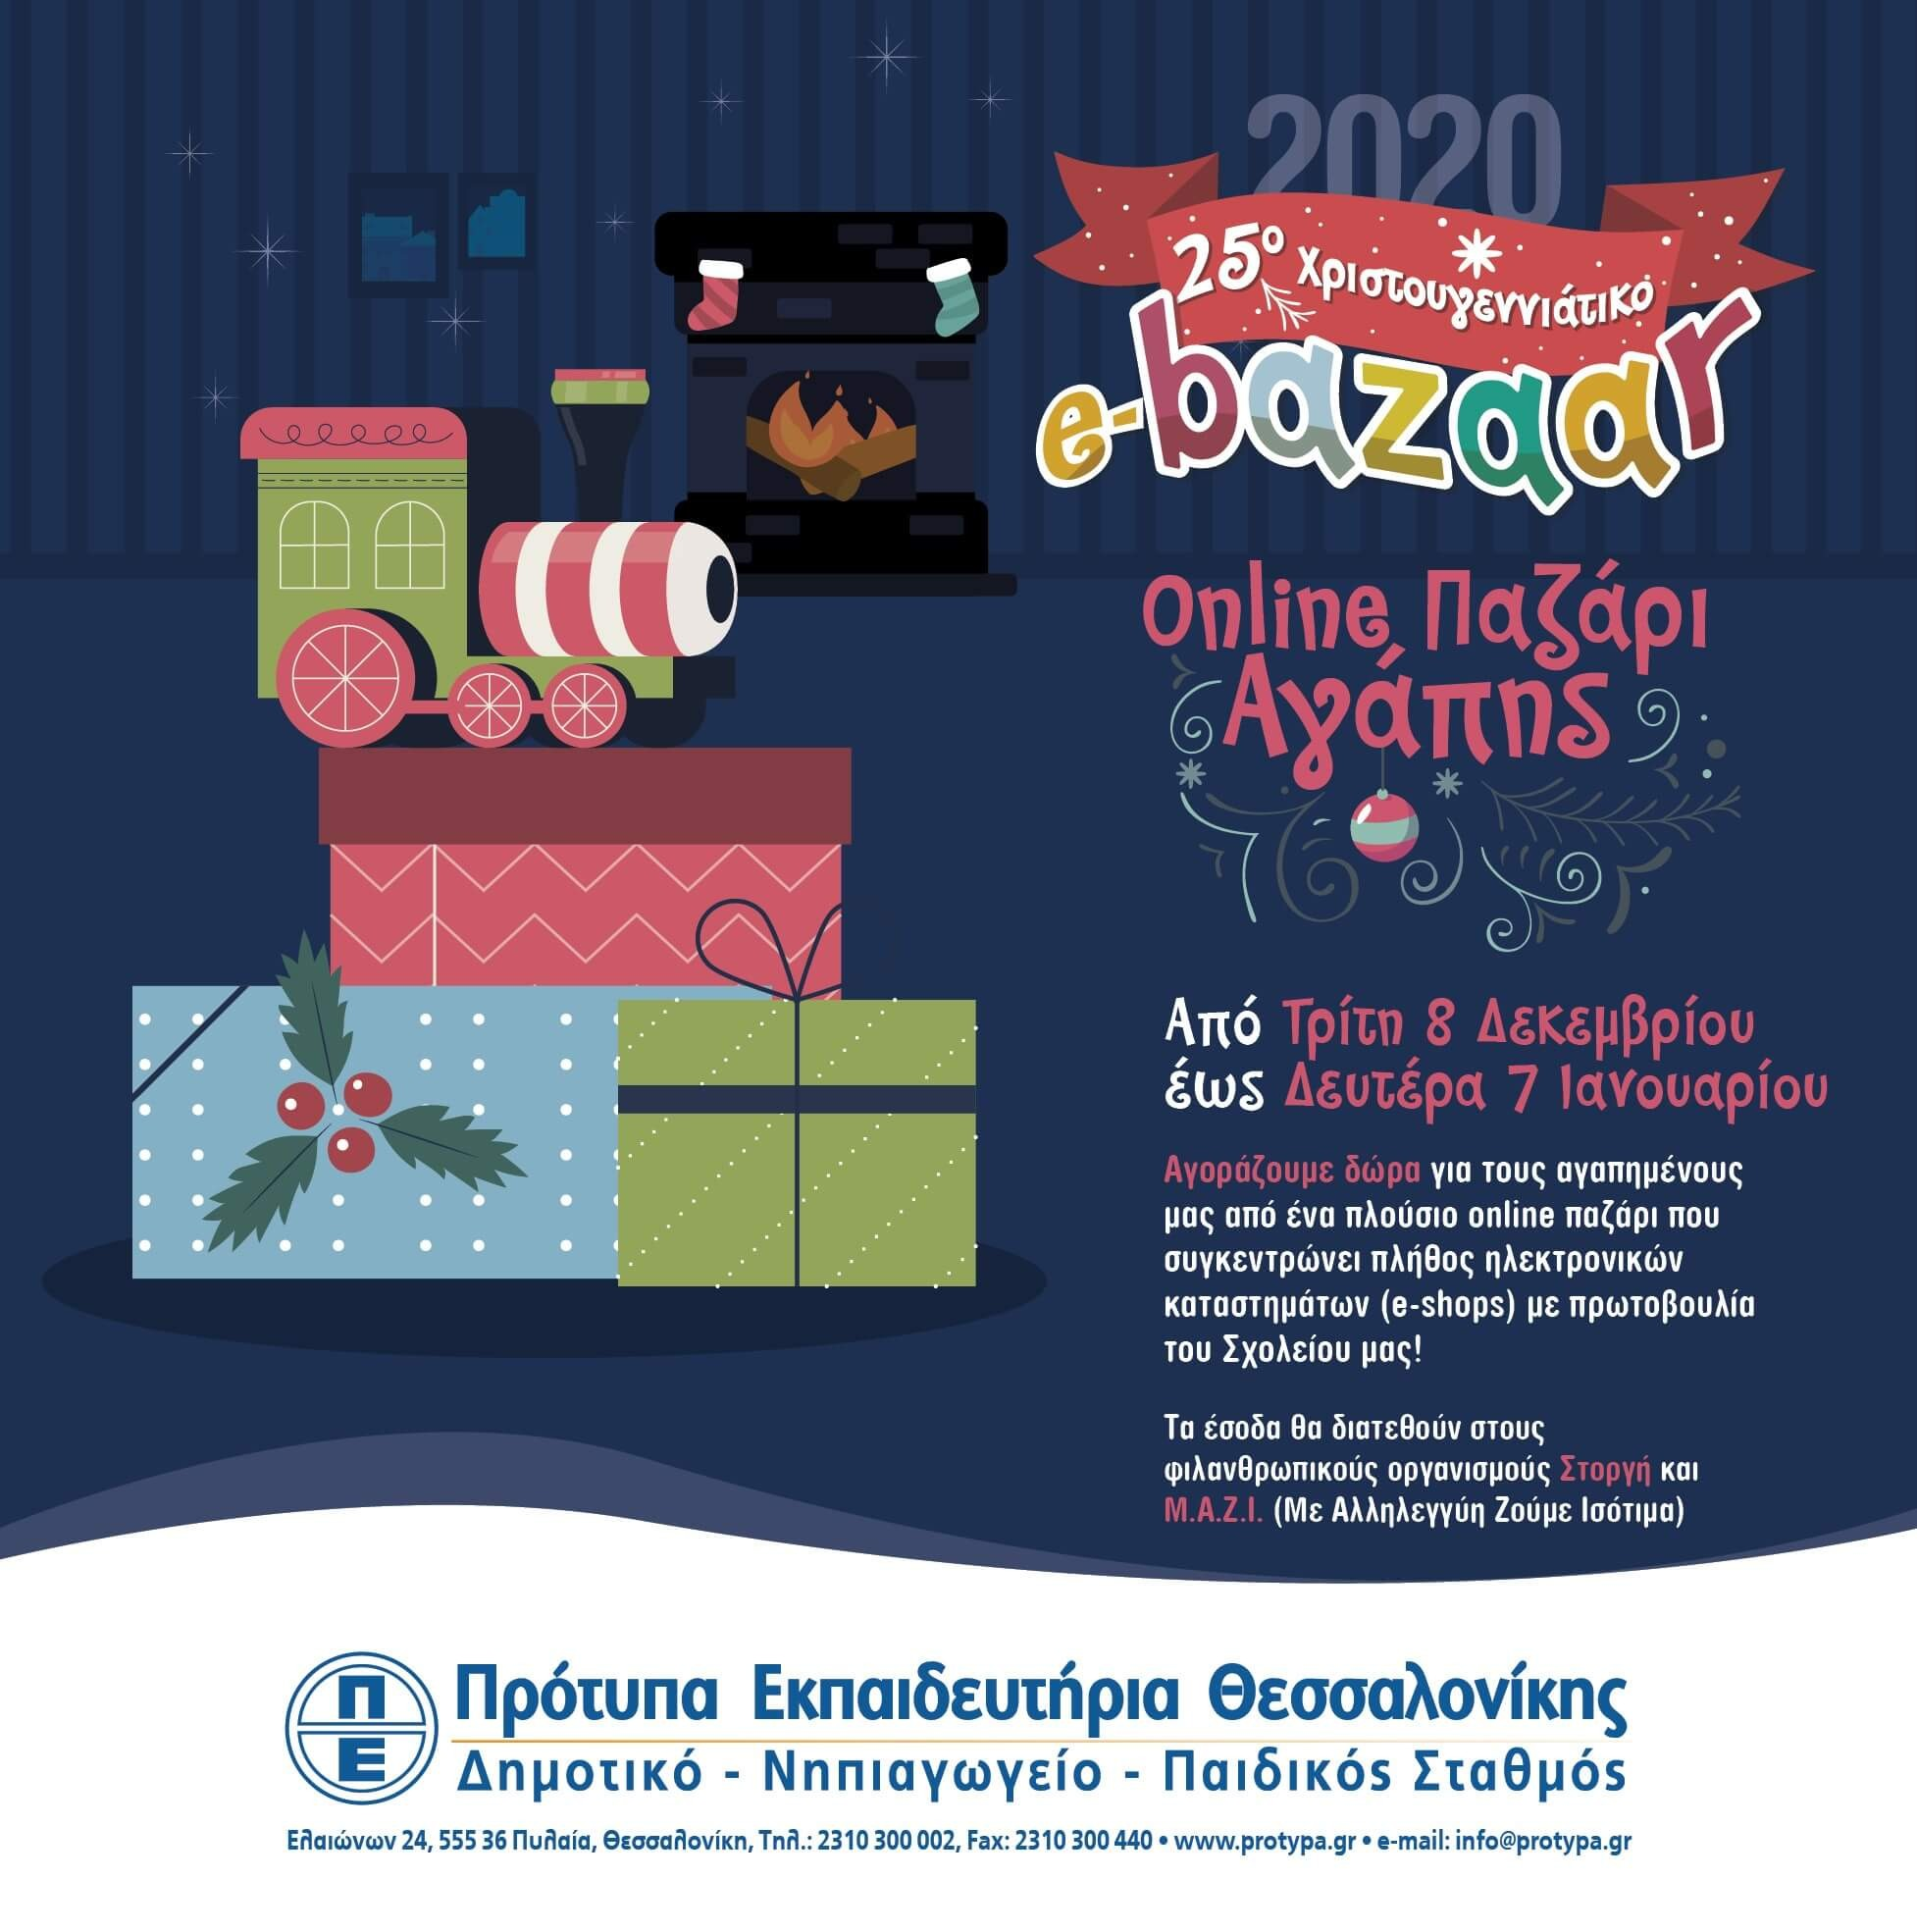 Online Παζάρι Αγάπης (e-shops)